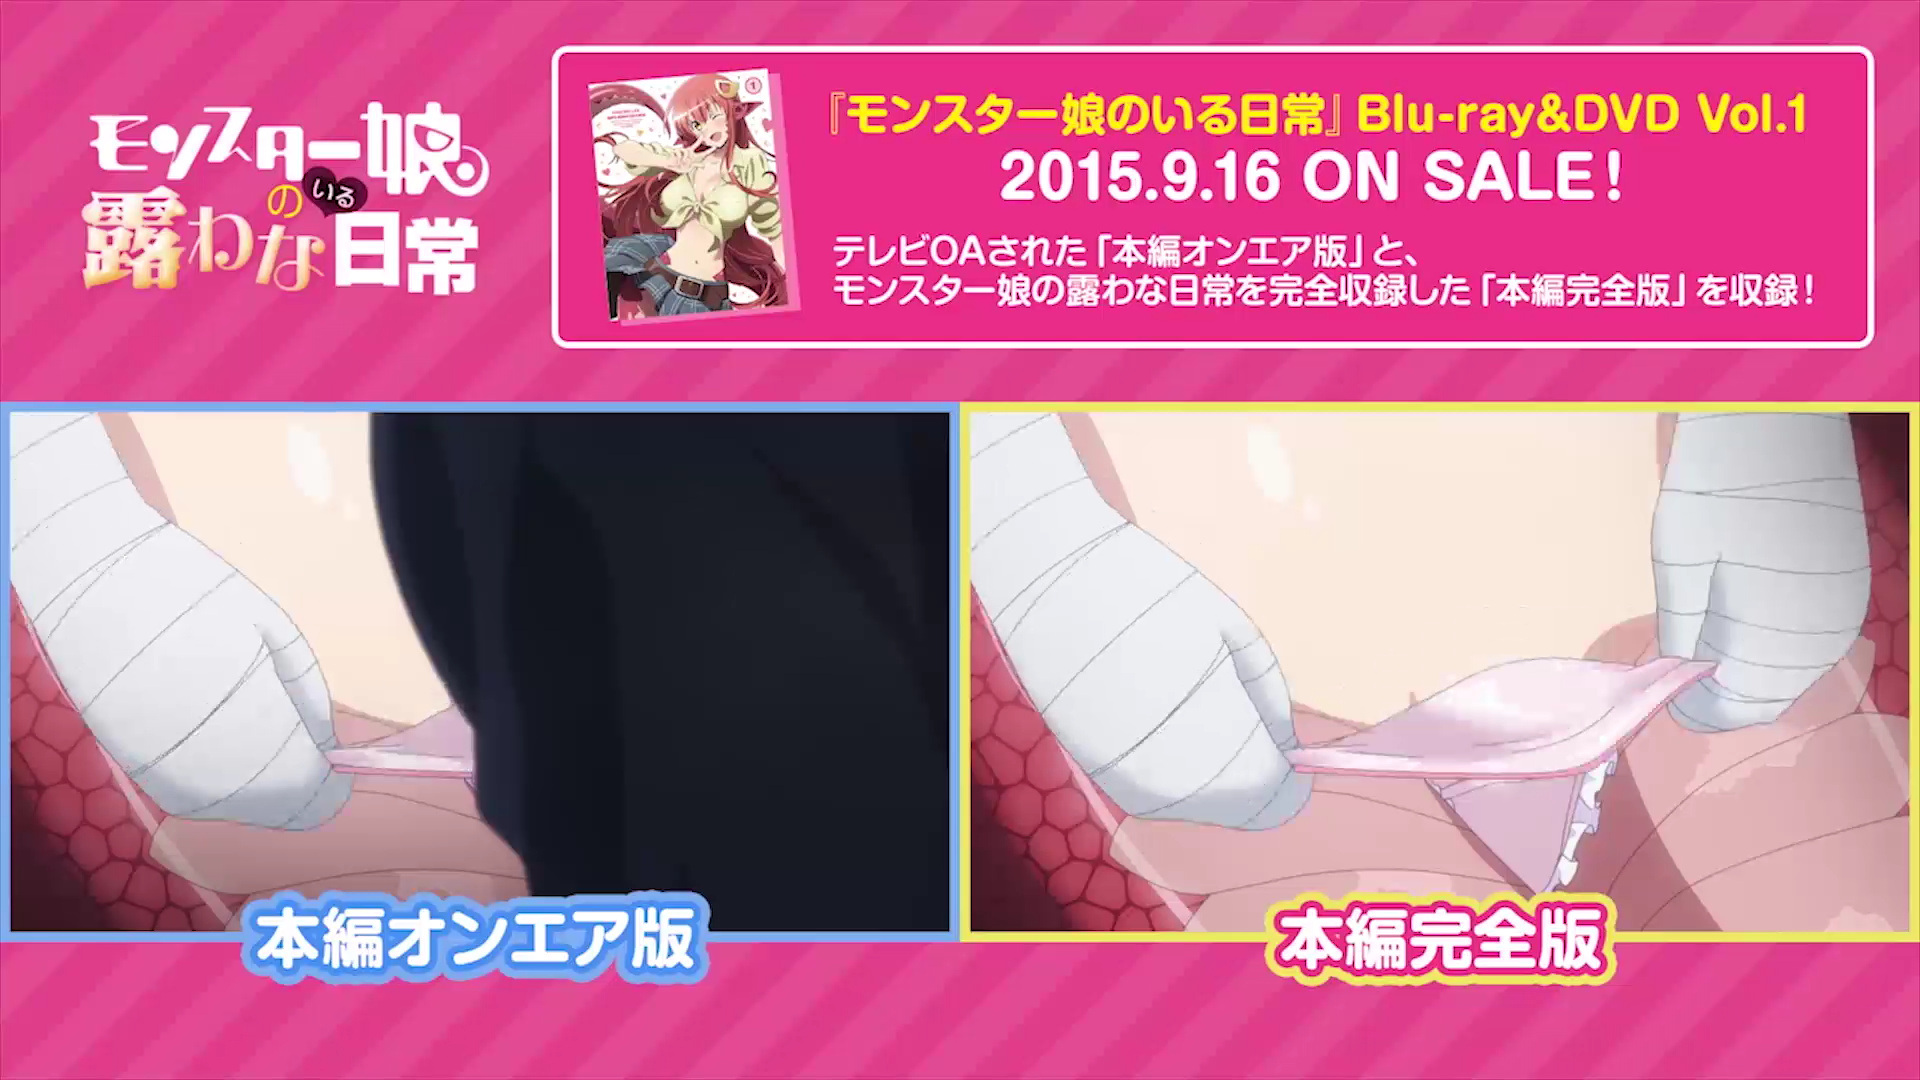 TV vs Blu-Ray Monster Musume anime blu-ray volume 1 uncensored 15